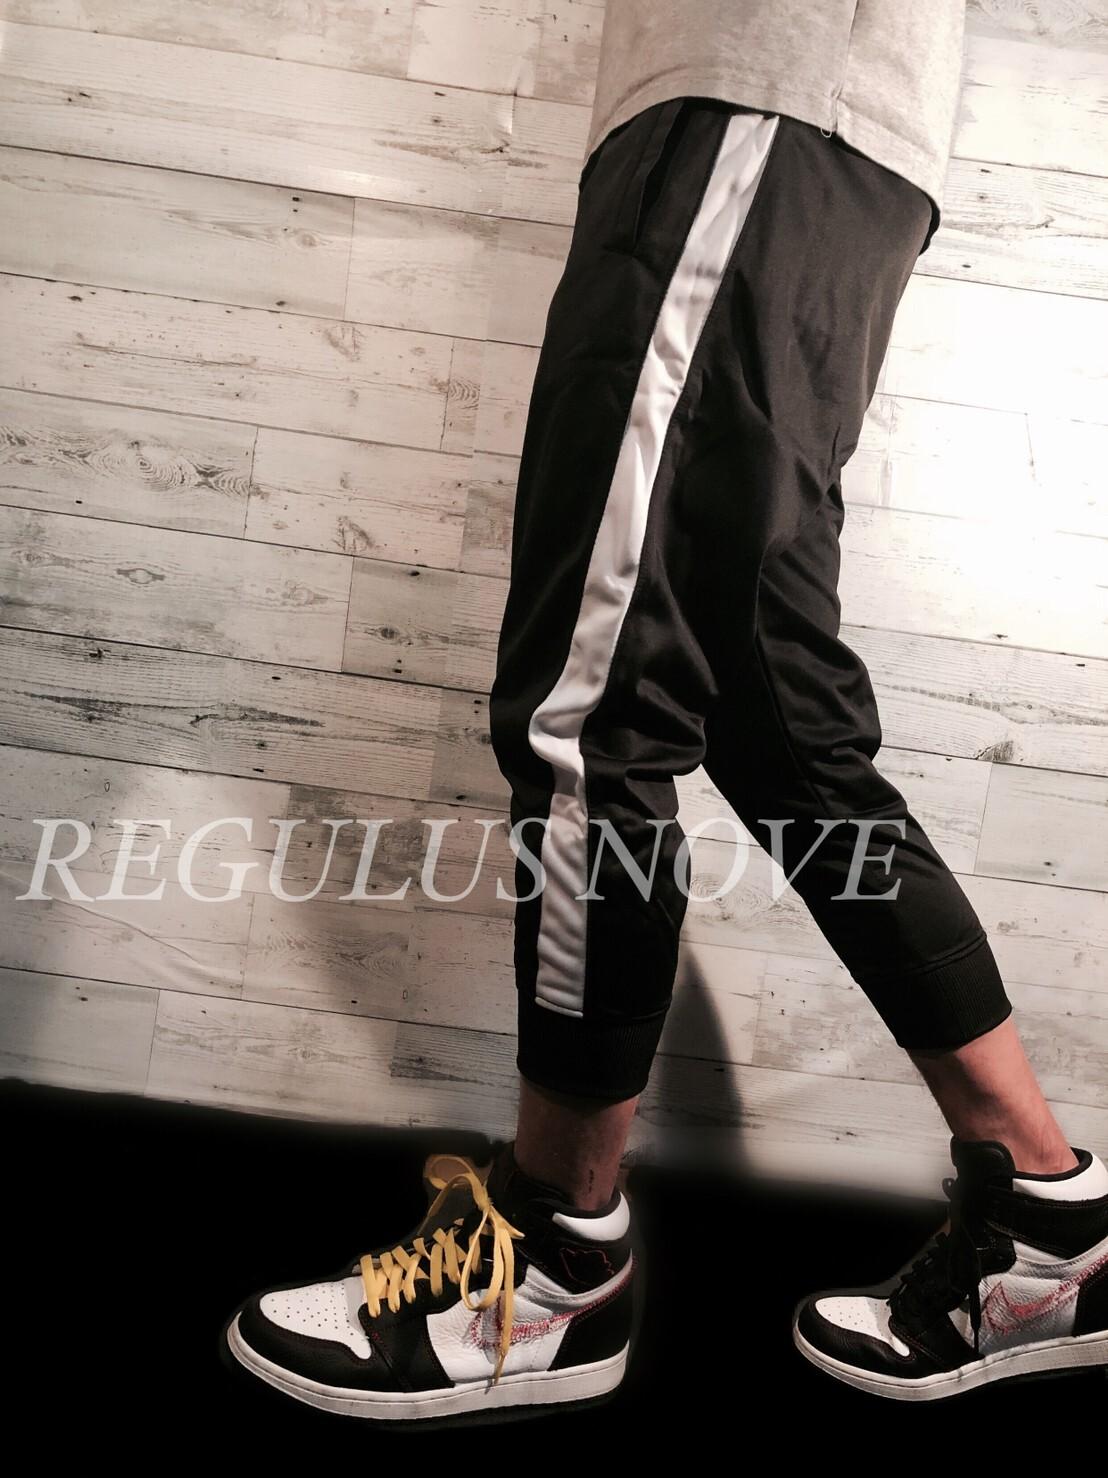 REGULUS NOVE サイドラインクロップドジョガーパンツ スウェット ルームウェア スポーツウェア 運動着 トレンド パンツ ボトム ジョガーパンツ